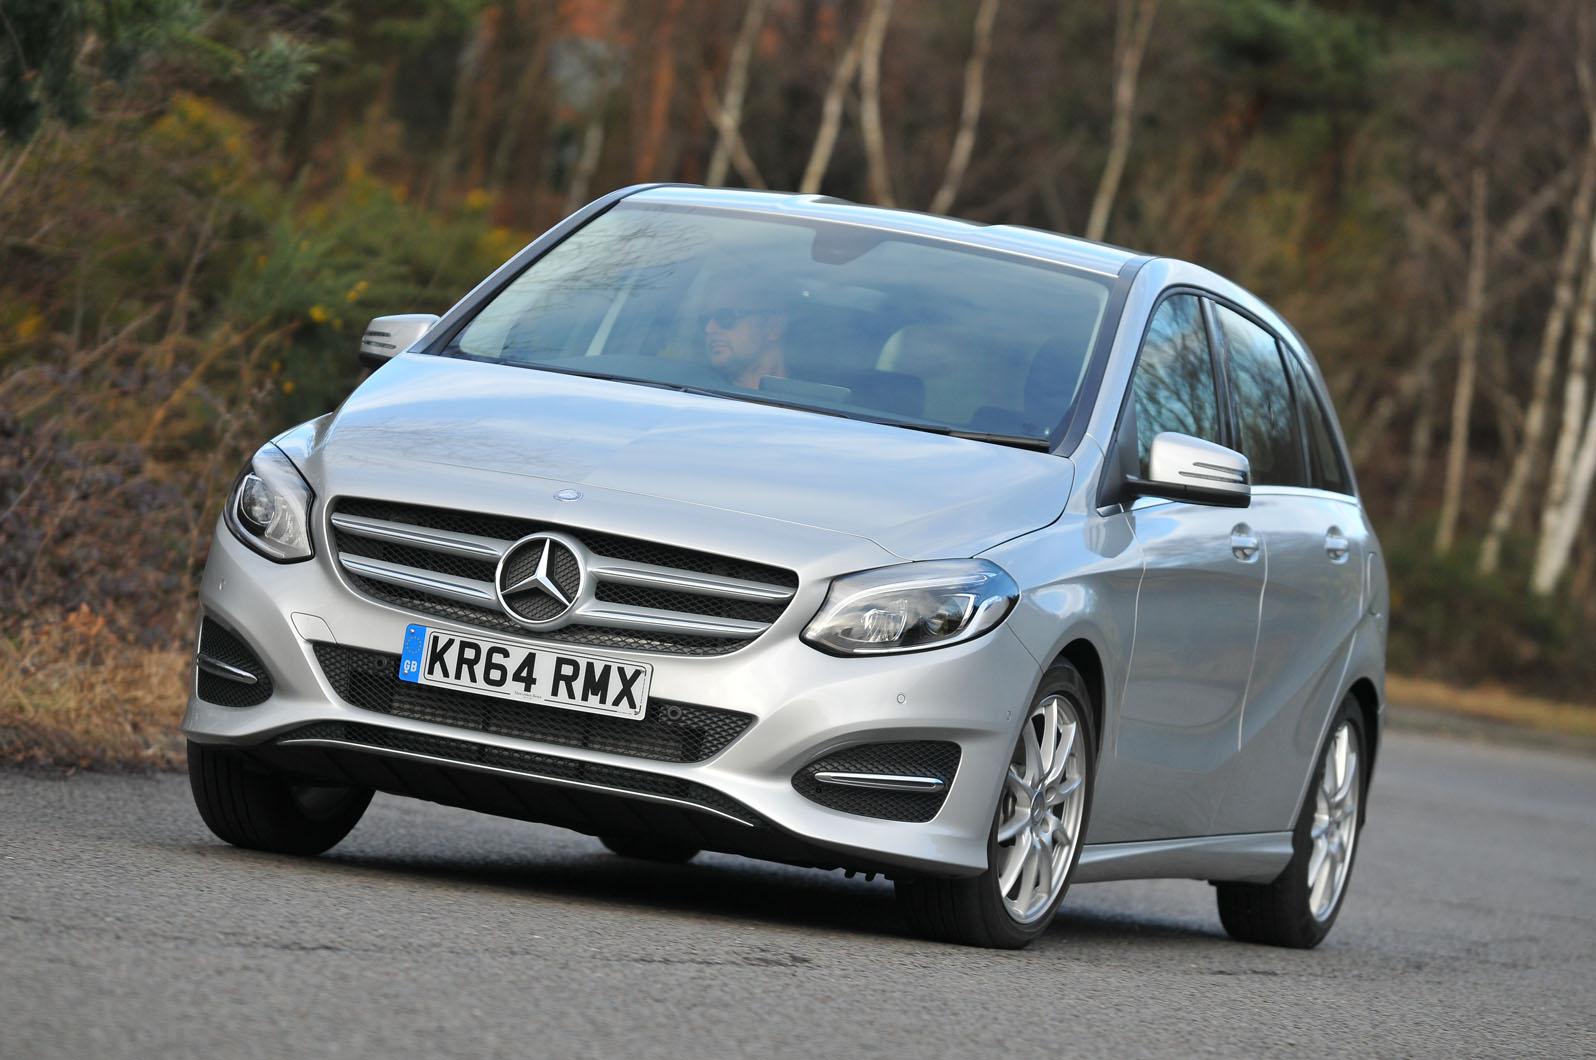 2015 Mercedes B 200 CDI Sport UK review review | Autocar